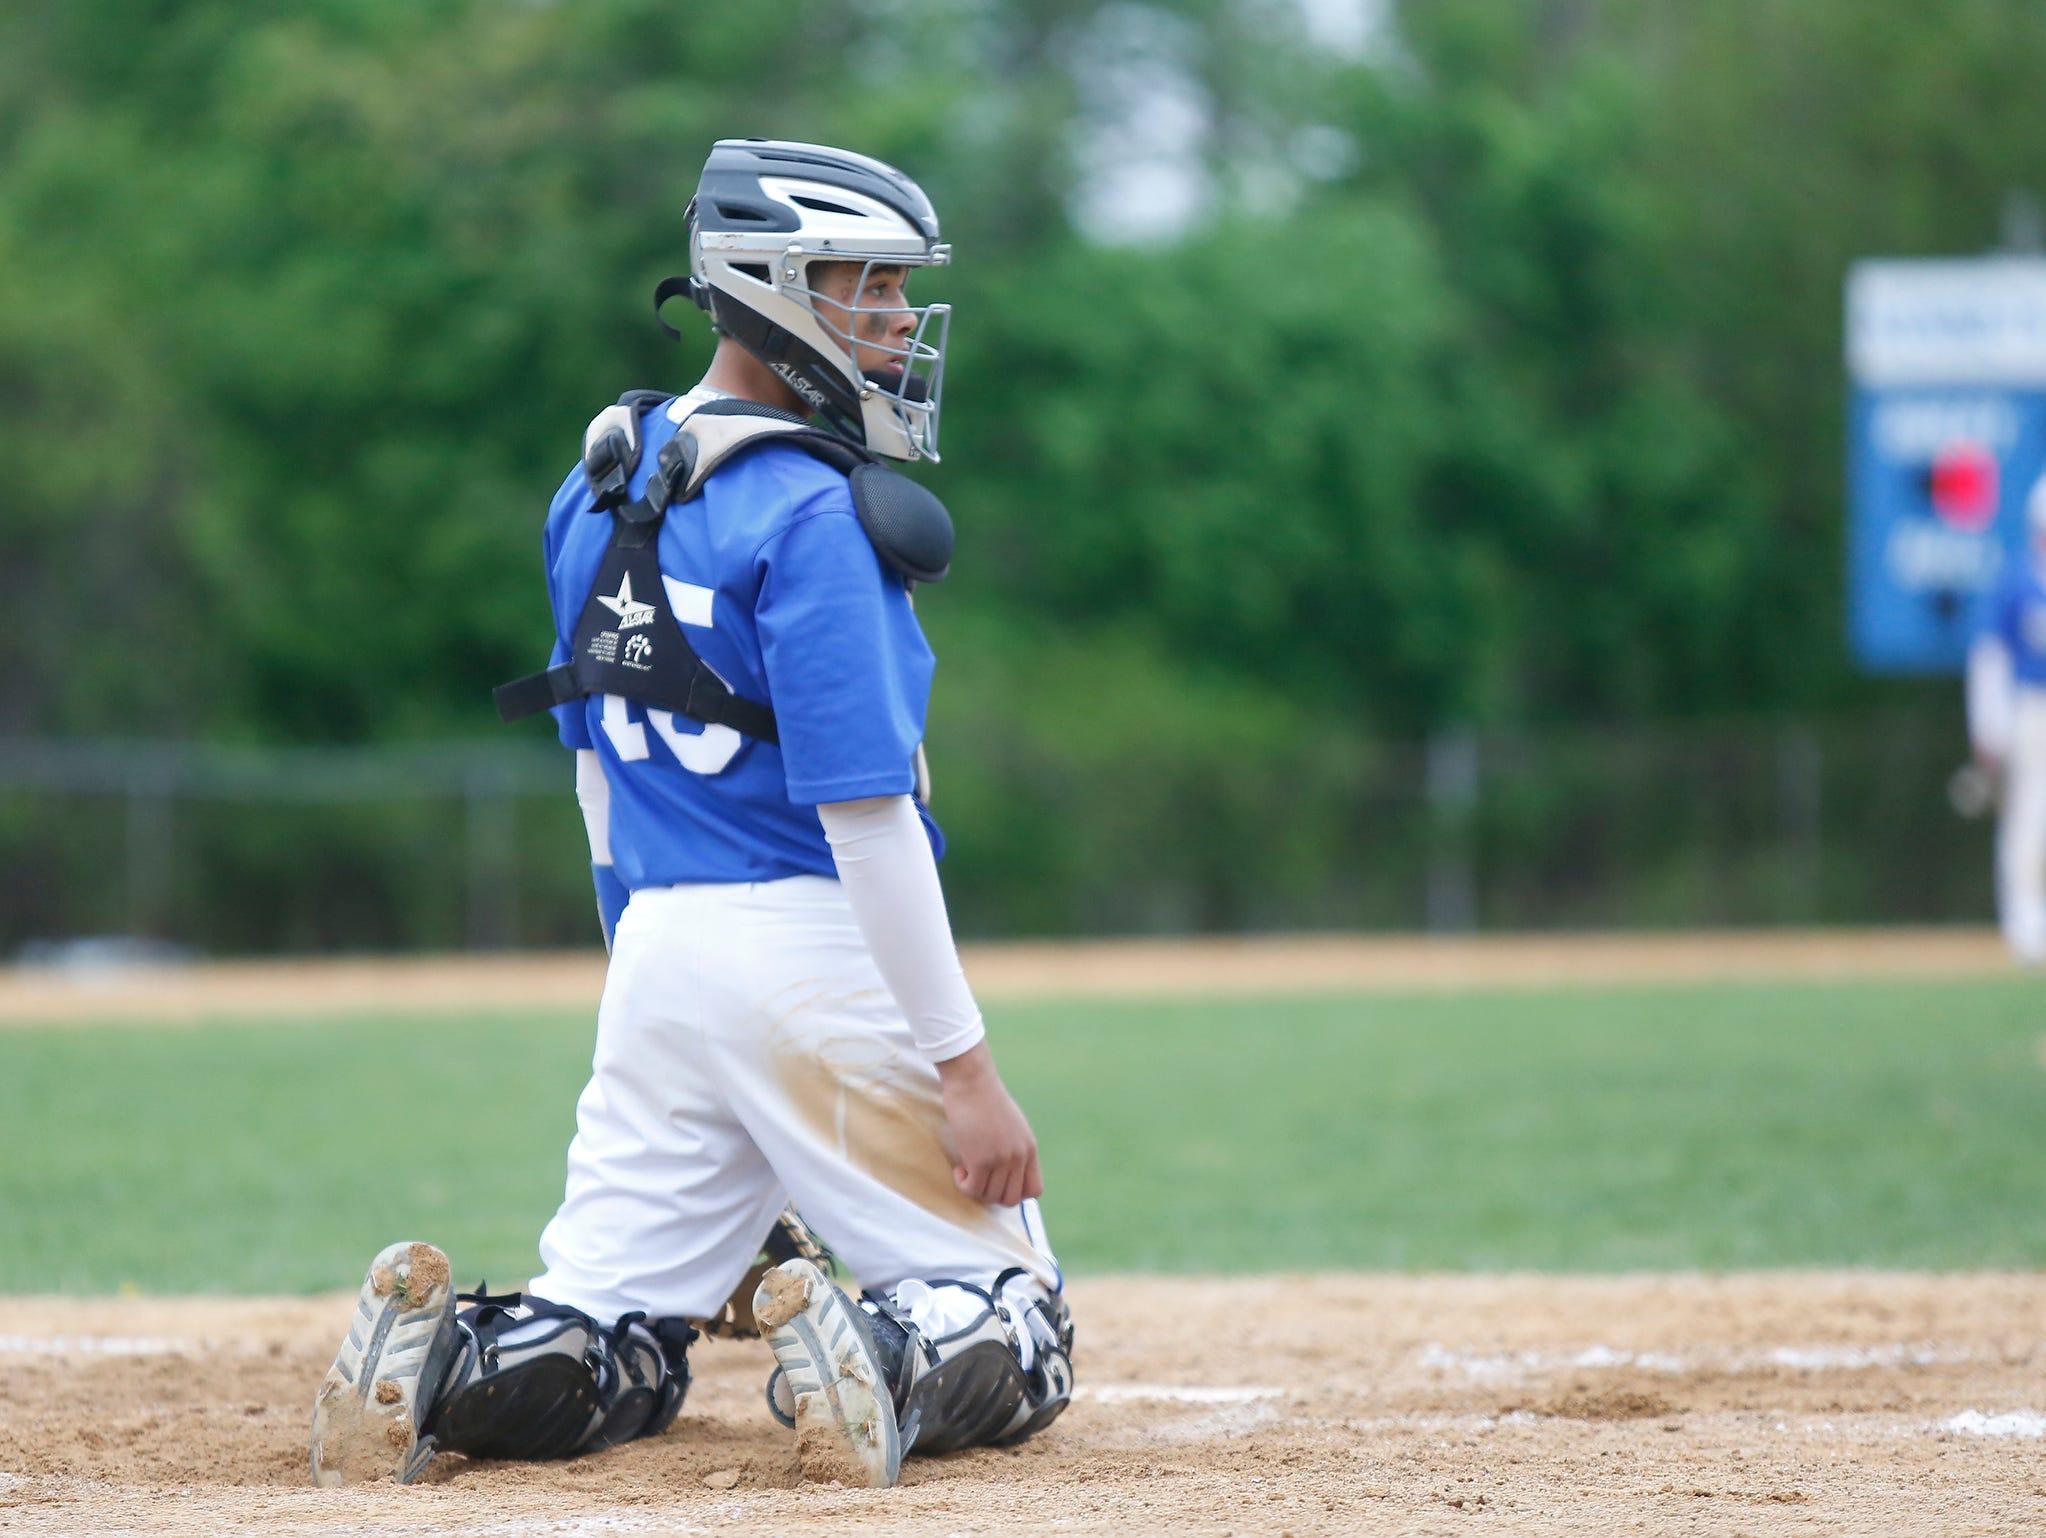 Hendrick Hudson catcher Daniel Weimar looks for a signal during a baseball game against Nanuet at Sunset Park in Montrose on Thursday, May 05, 2016. Hendrick Hudson won 6-2.